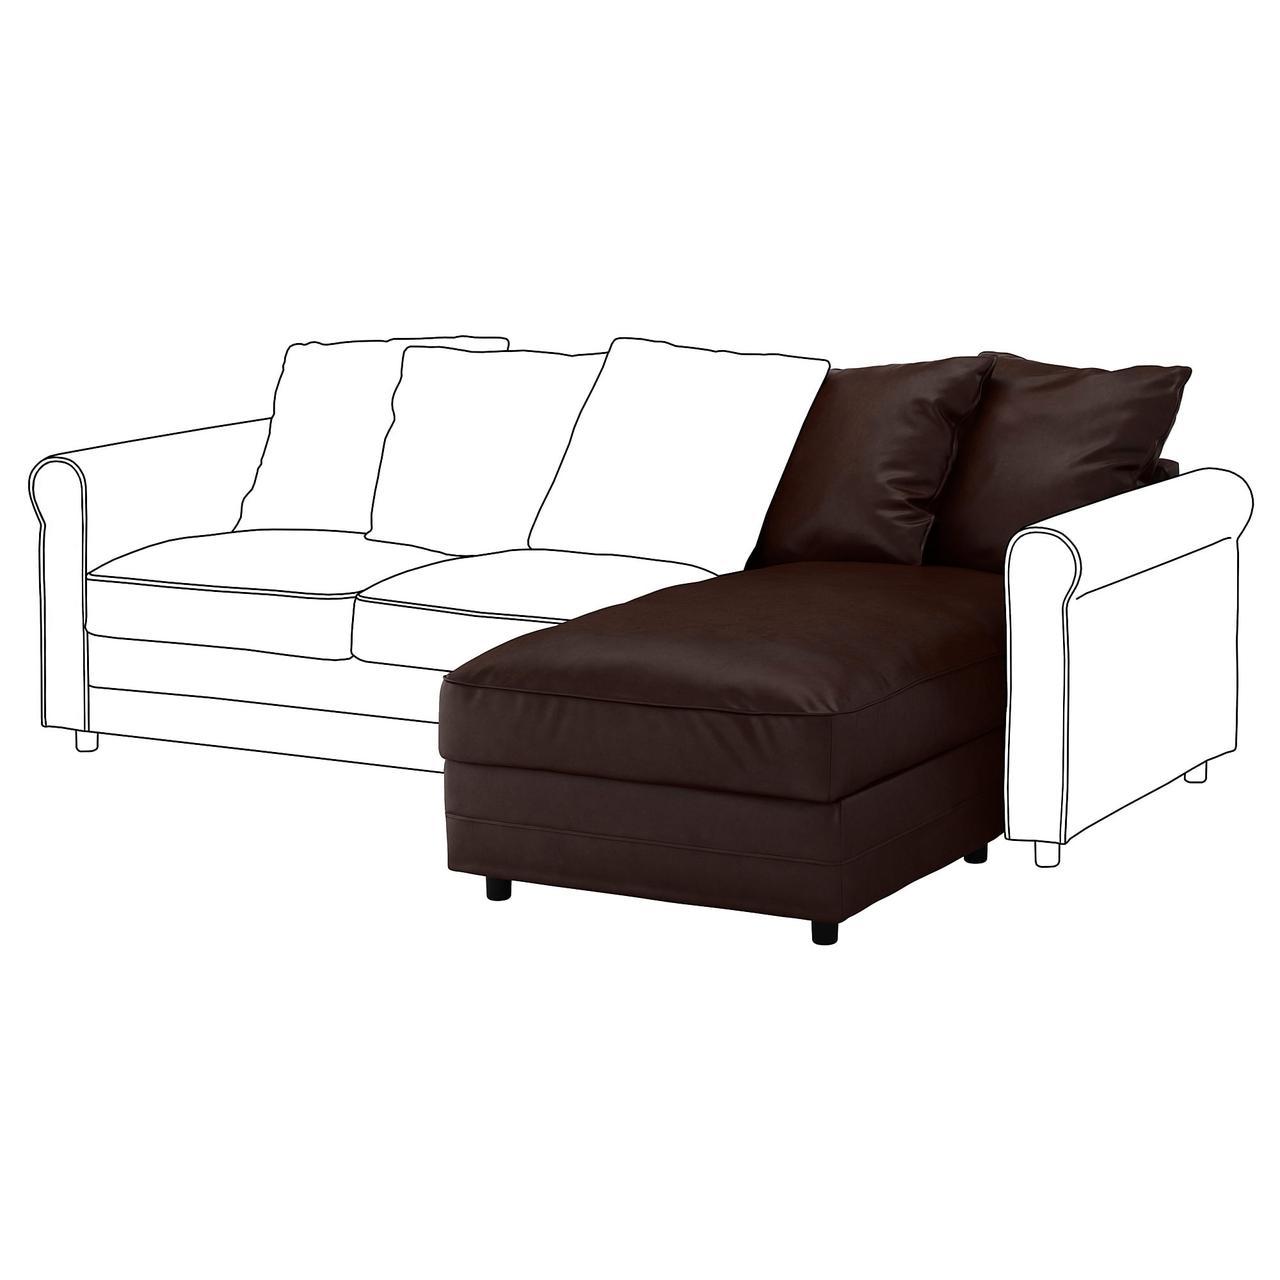 IKEA Модульная секция дивана GRÖNLID (803.986.28)